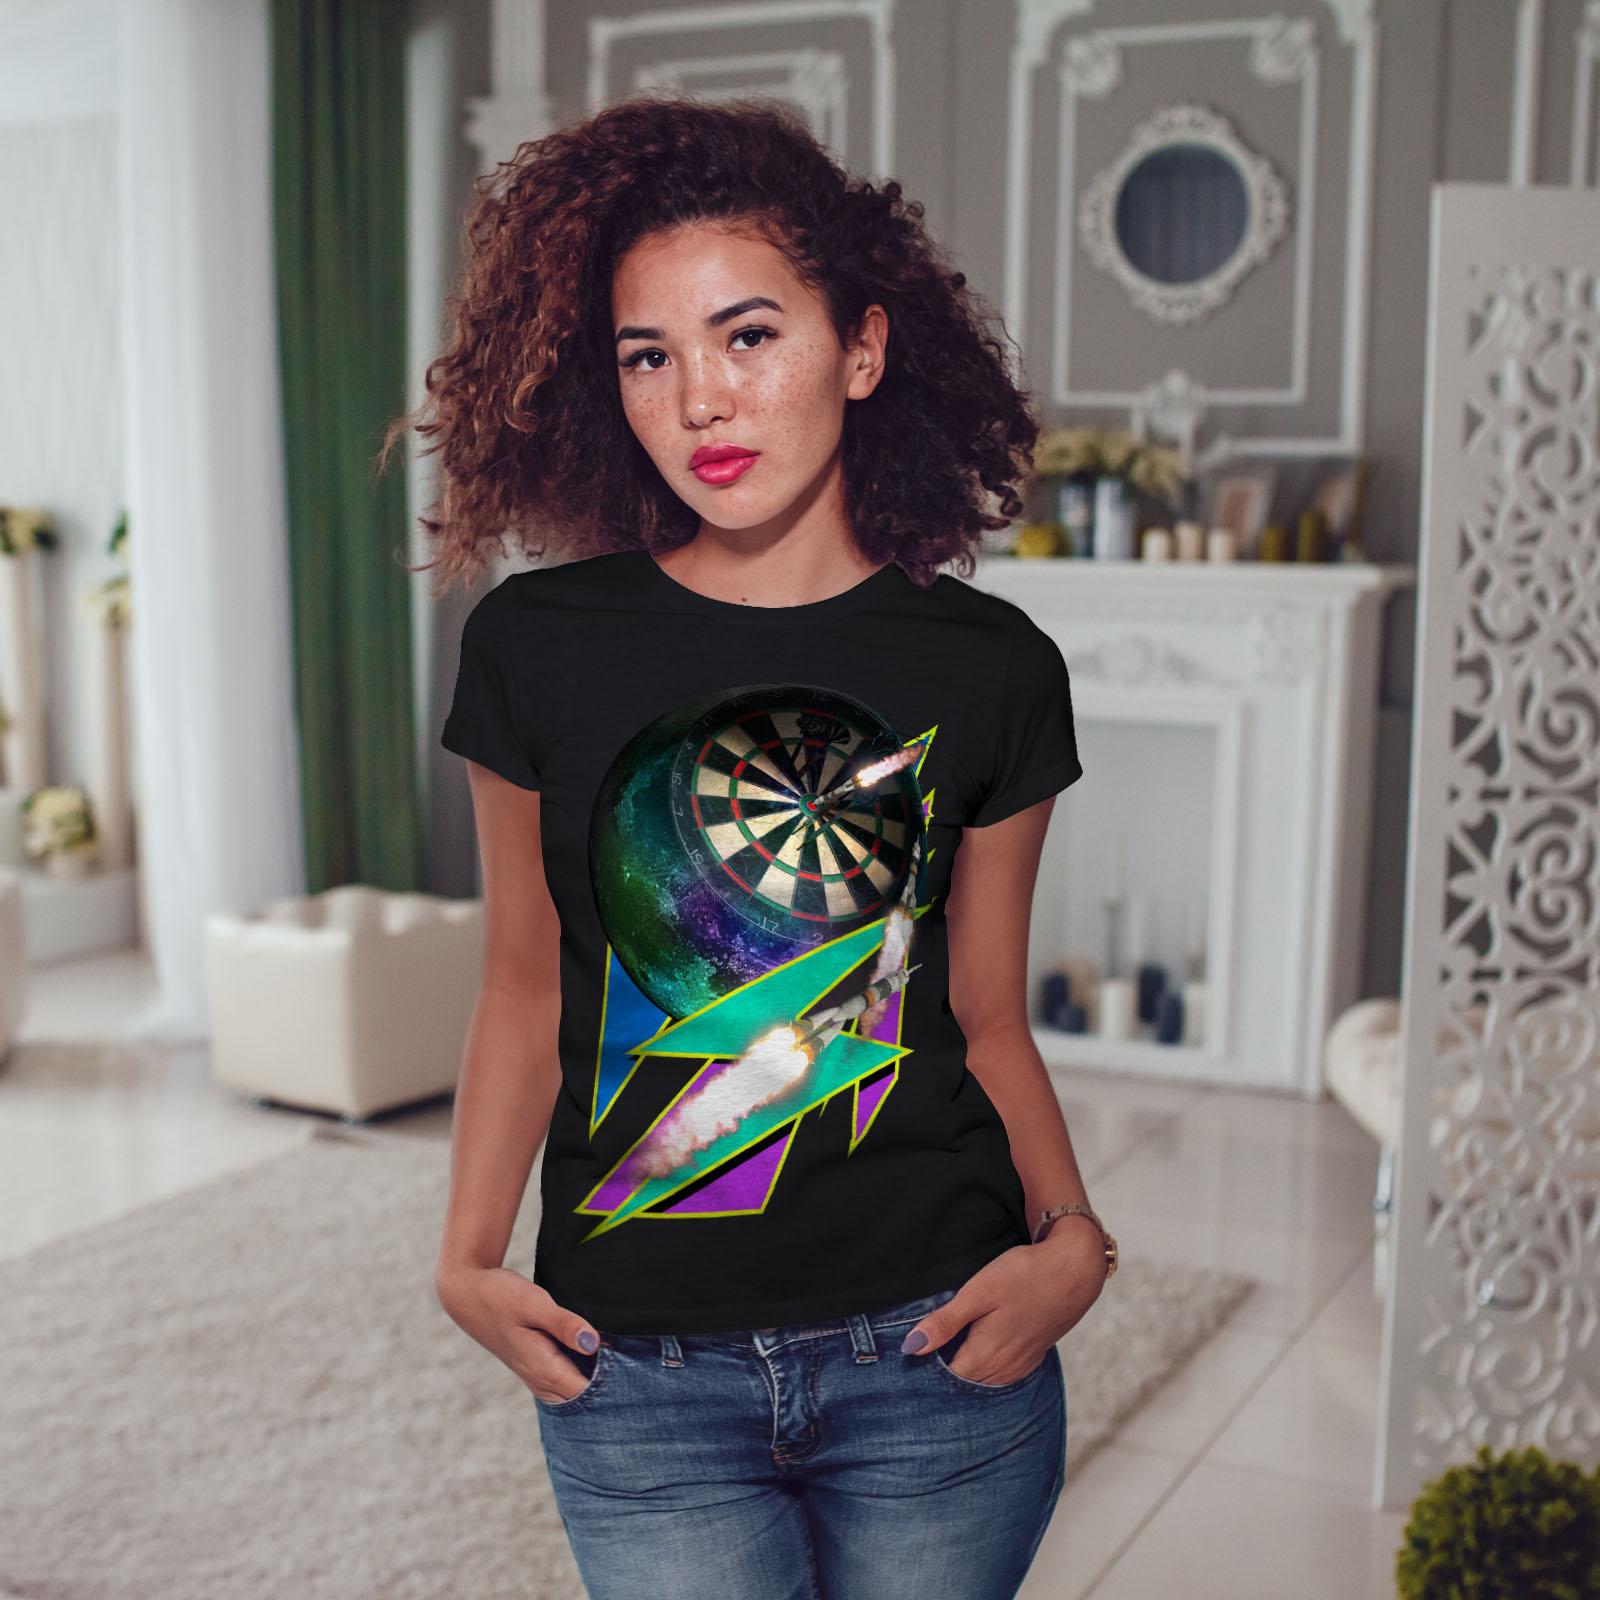 miniature 5 - Wellcoda Dart Board Gaming Womens T-shirt, Achieve Casual Design Printed Tee